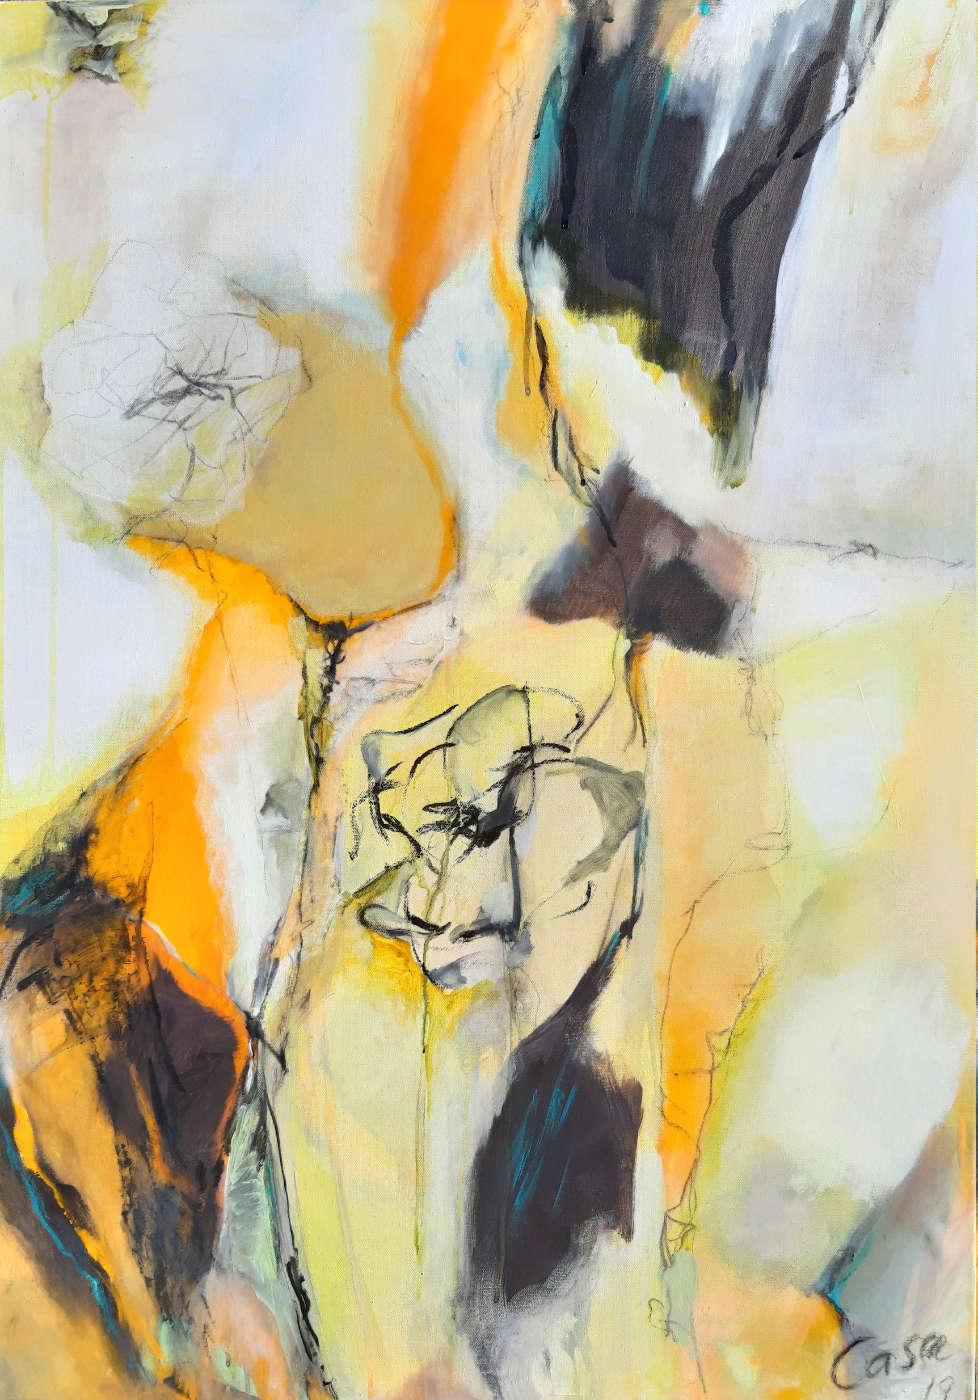 ohne Titel - Acryl, mixed media auf Leinwand, 100 x 70 cm